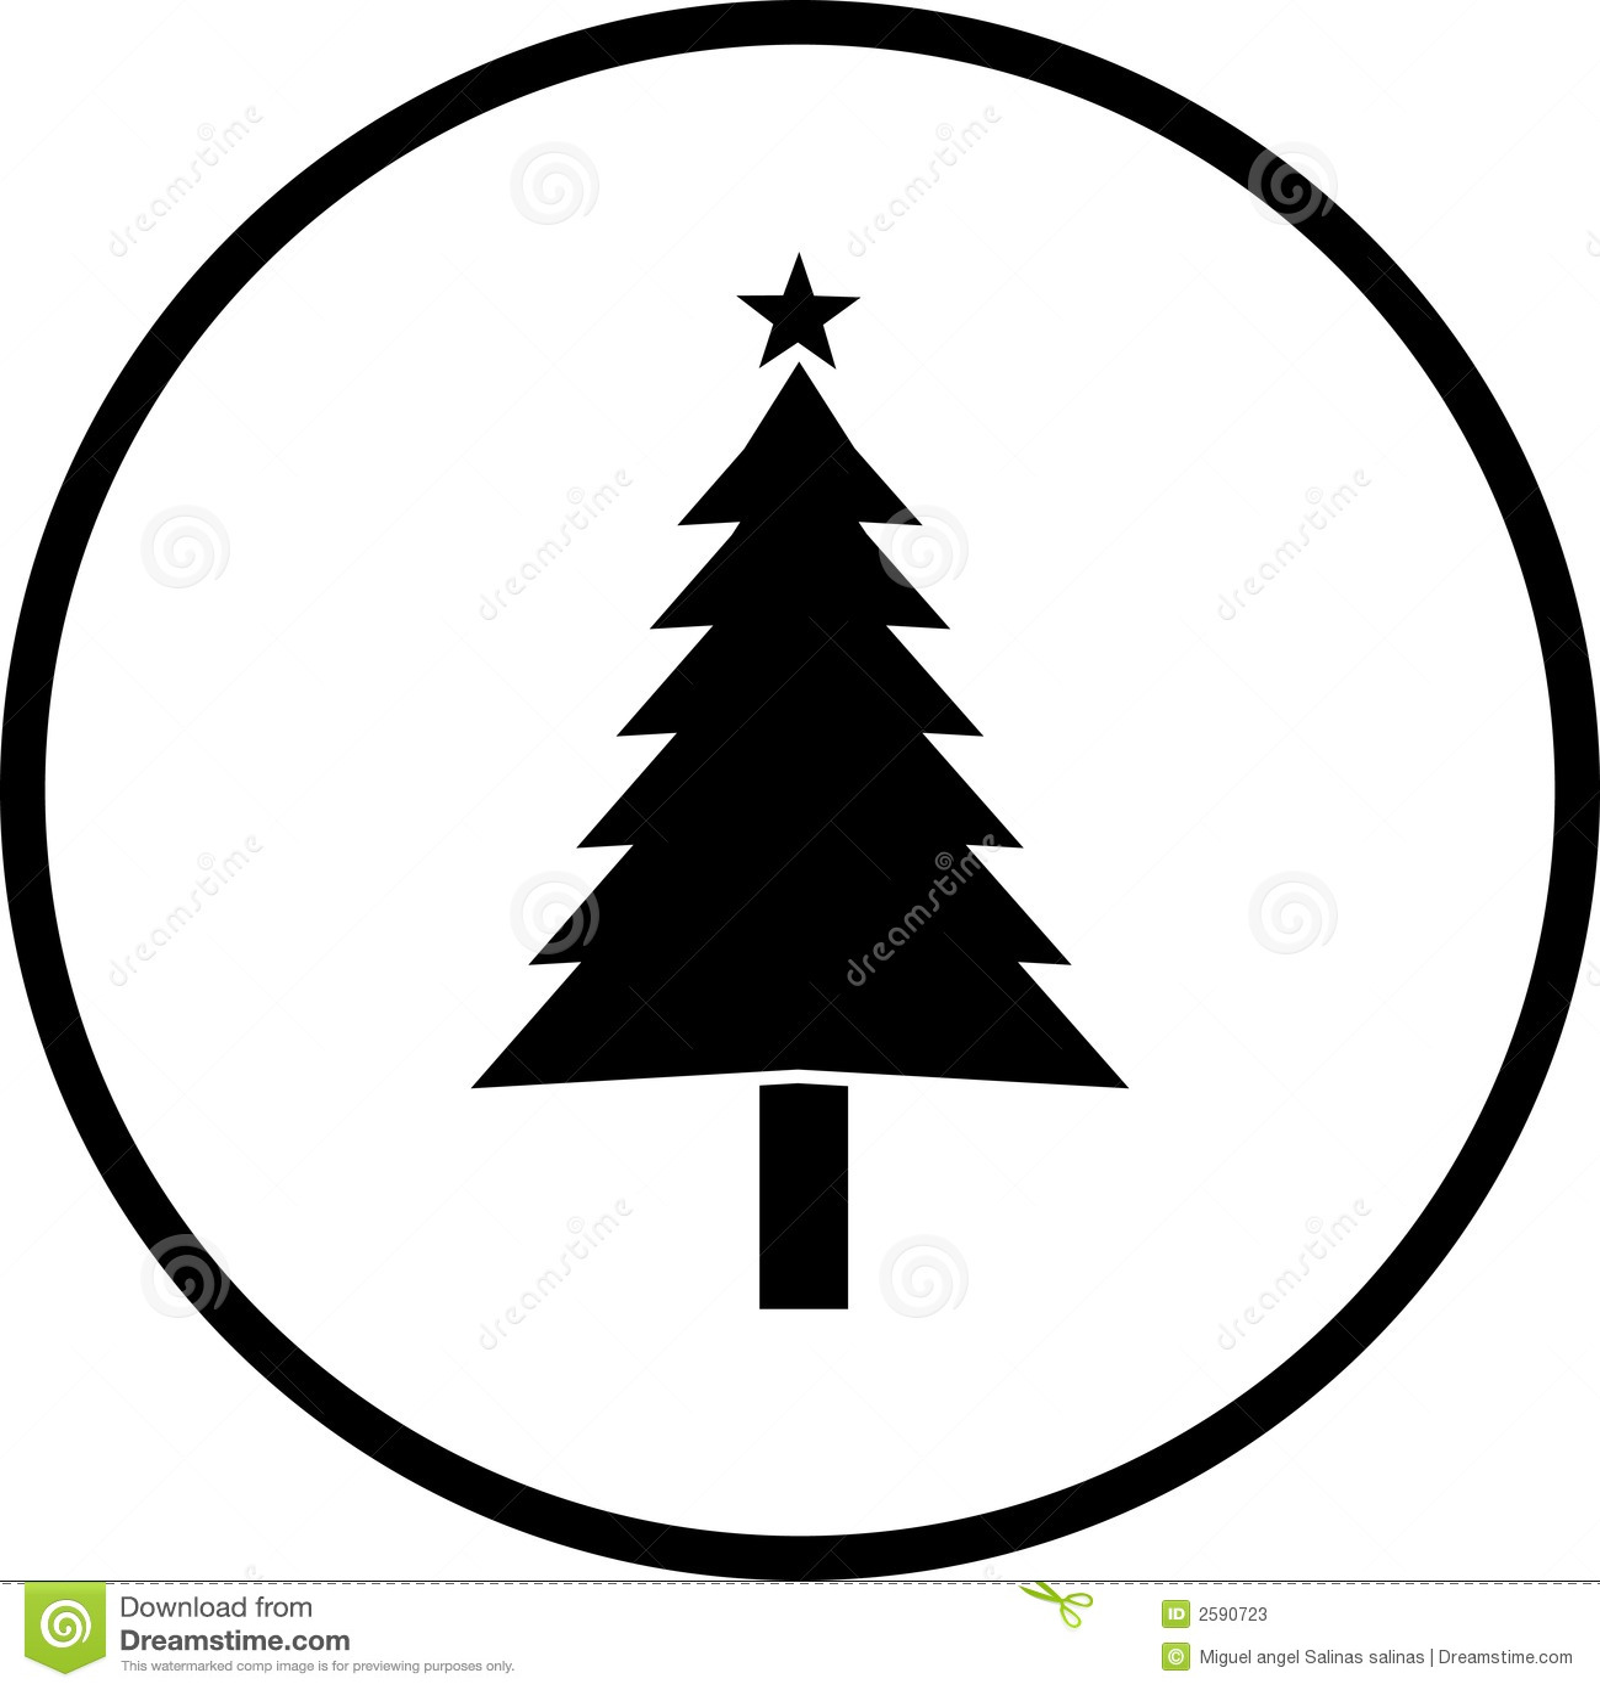 Christmas Tree Vector Symbol Stock Photos - Image: 2590723